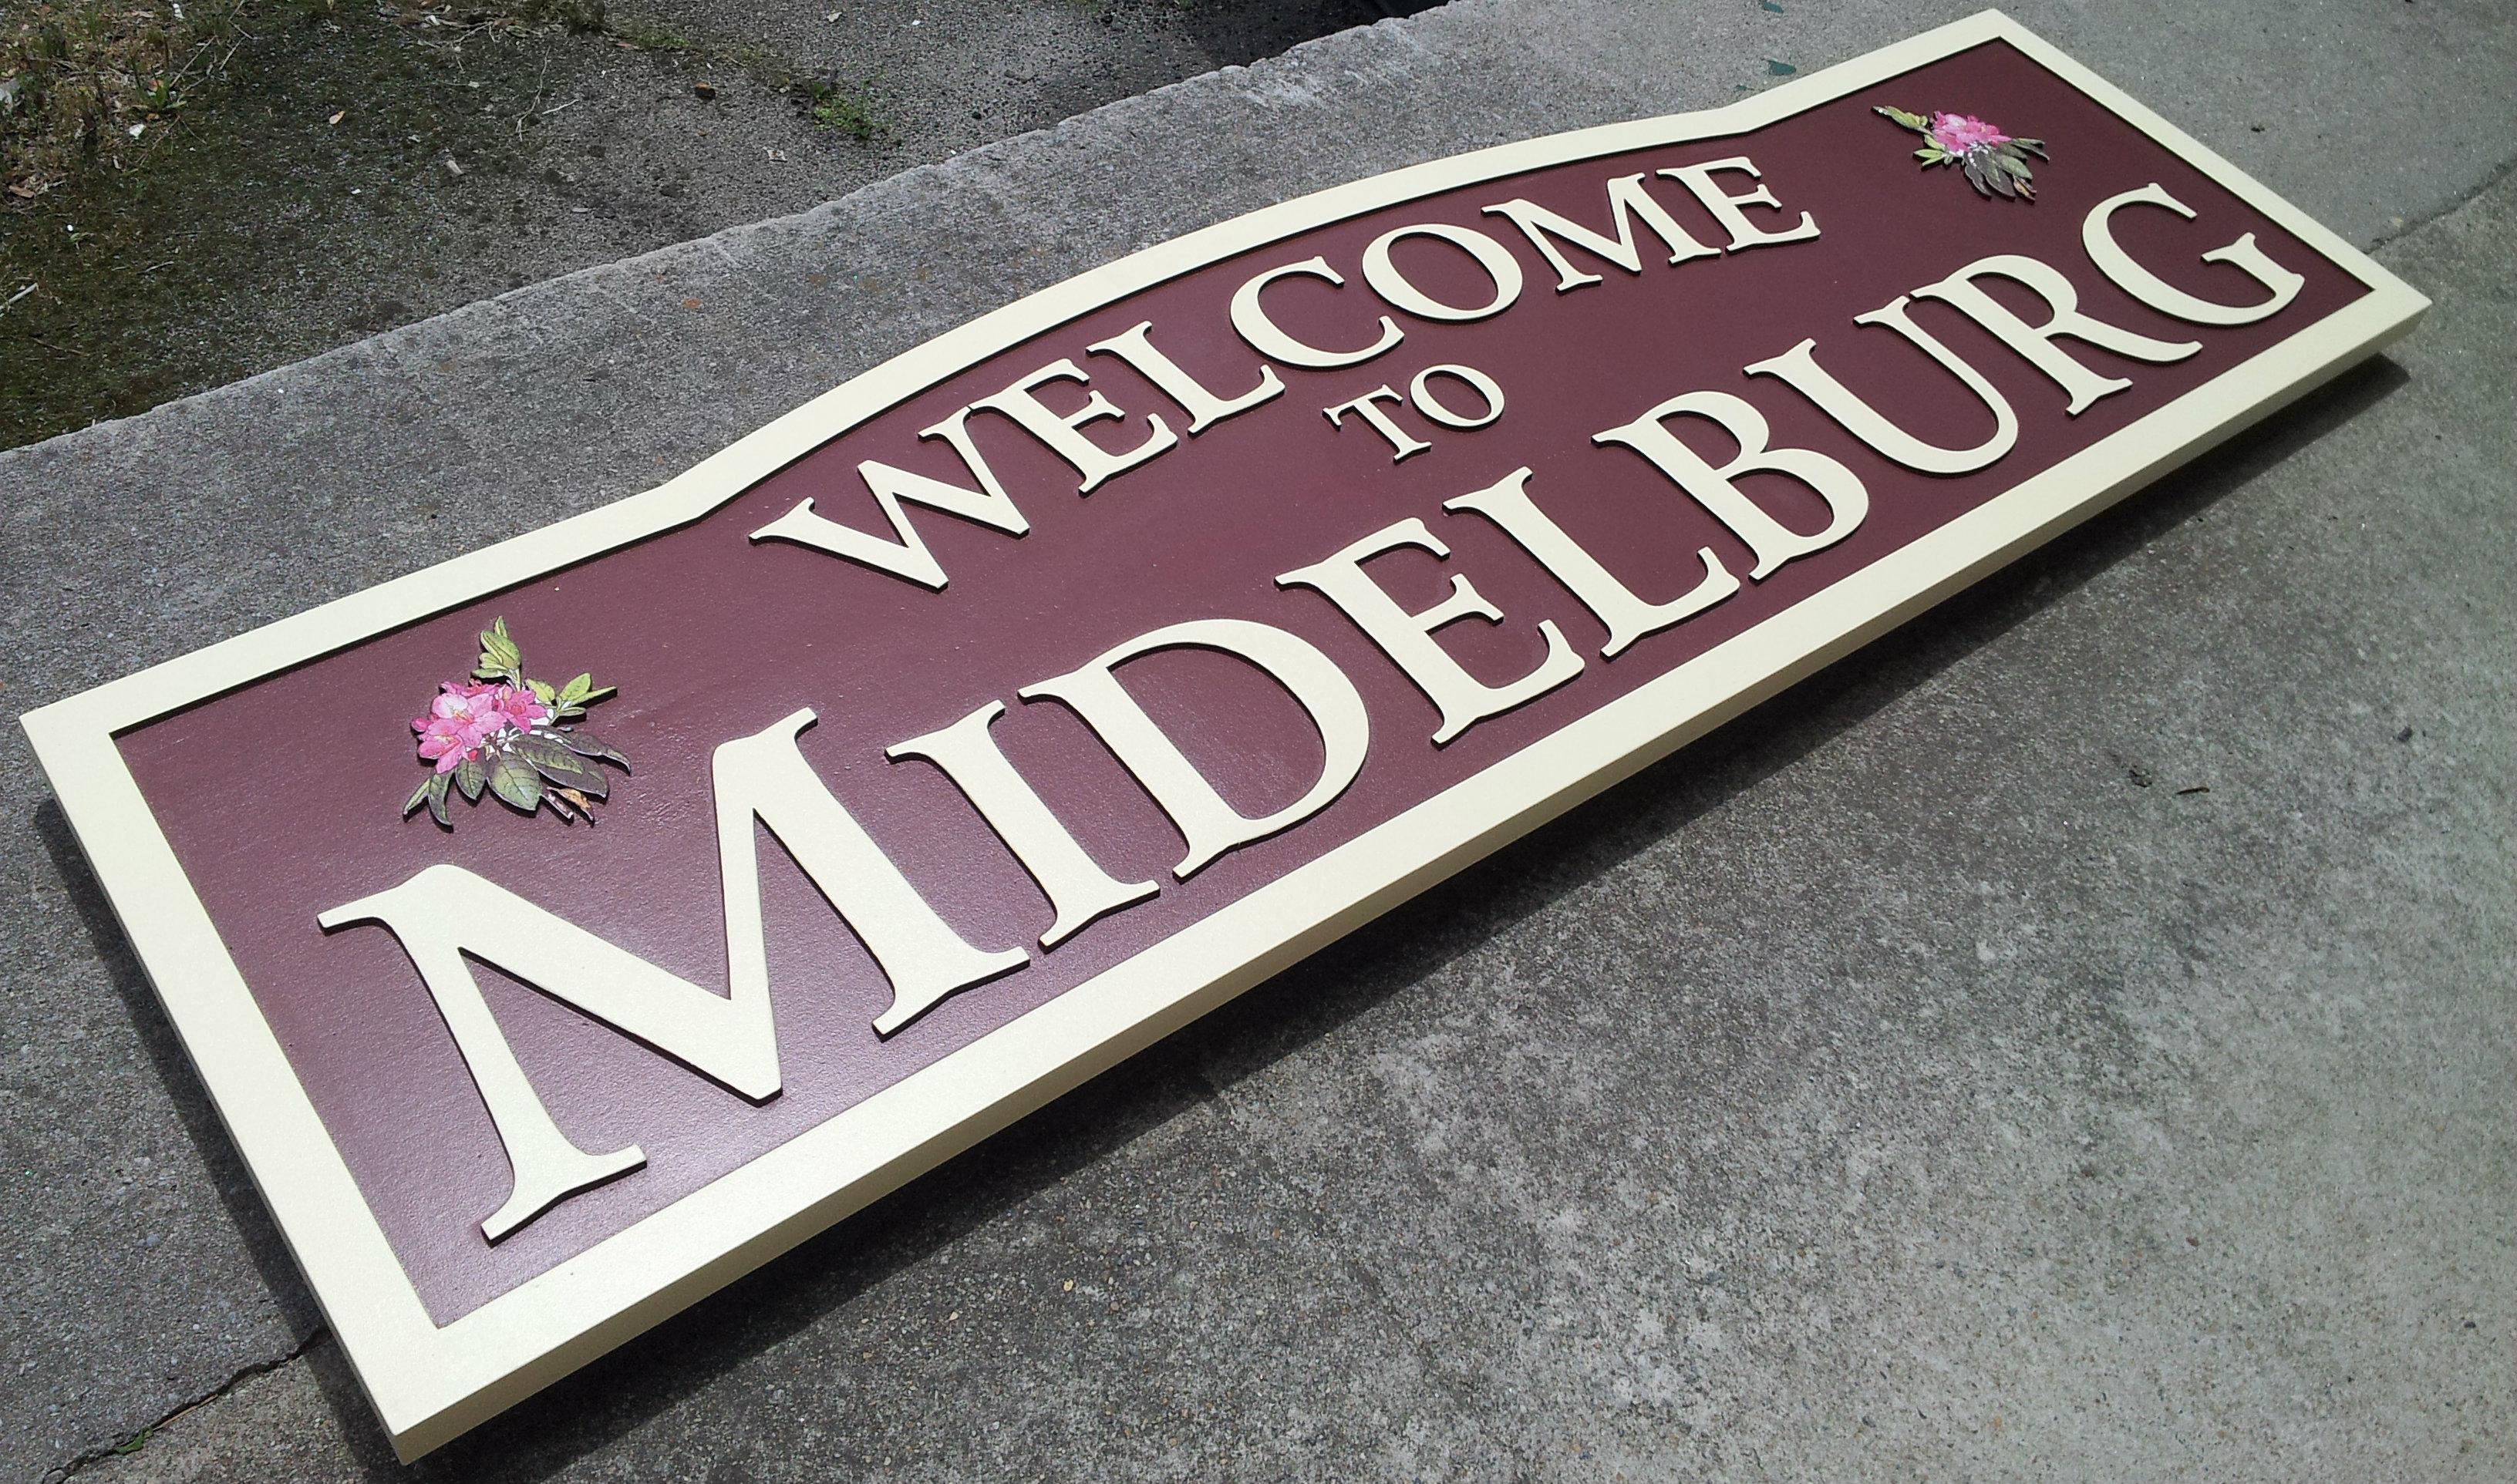 Midelburg